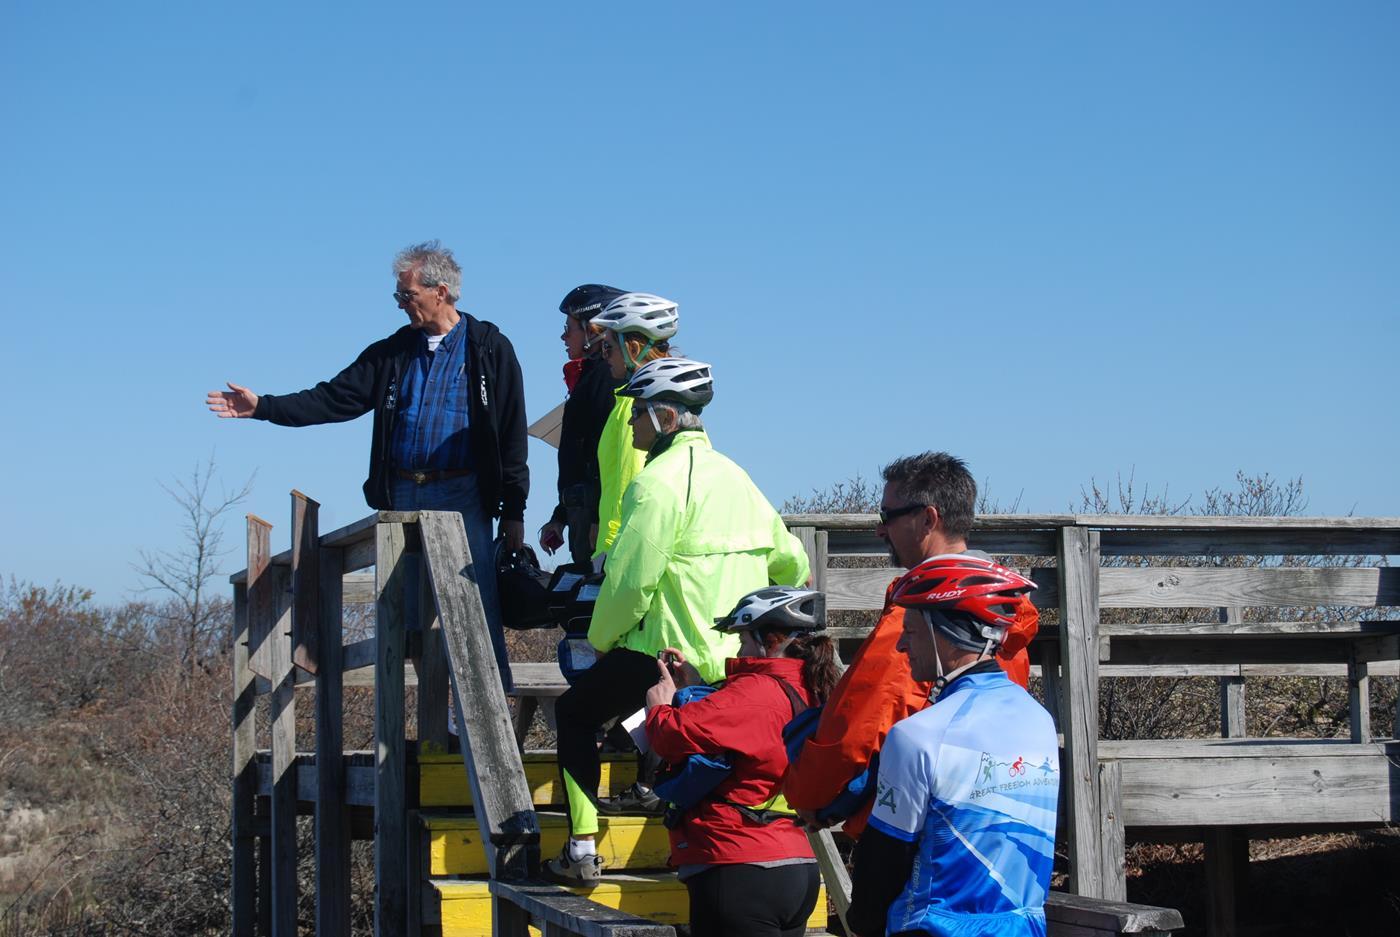 eco bike adventure tour 5